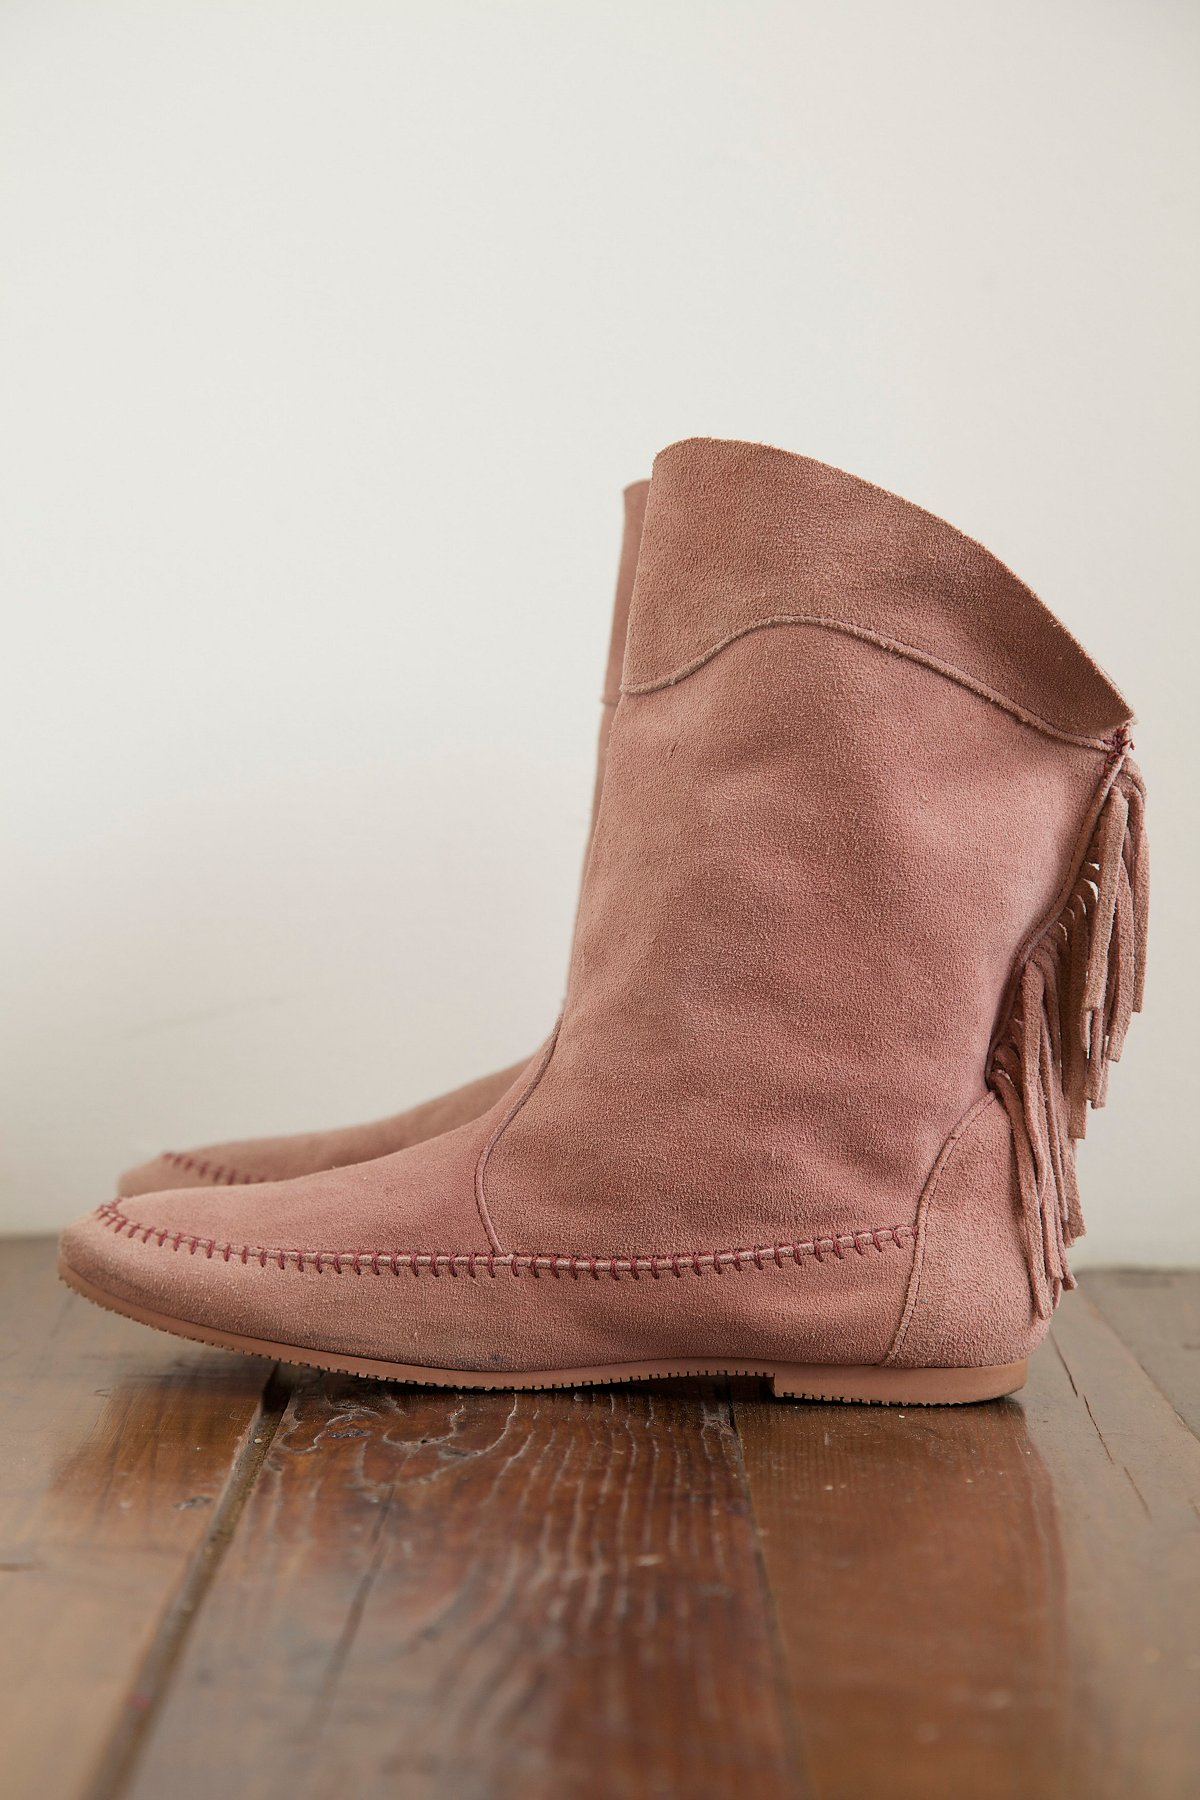 Vintage Moccasin Boots